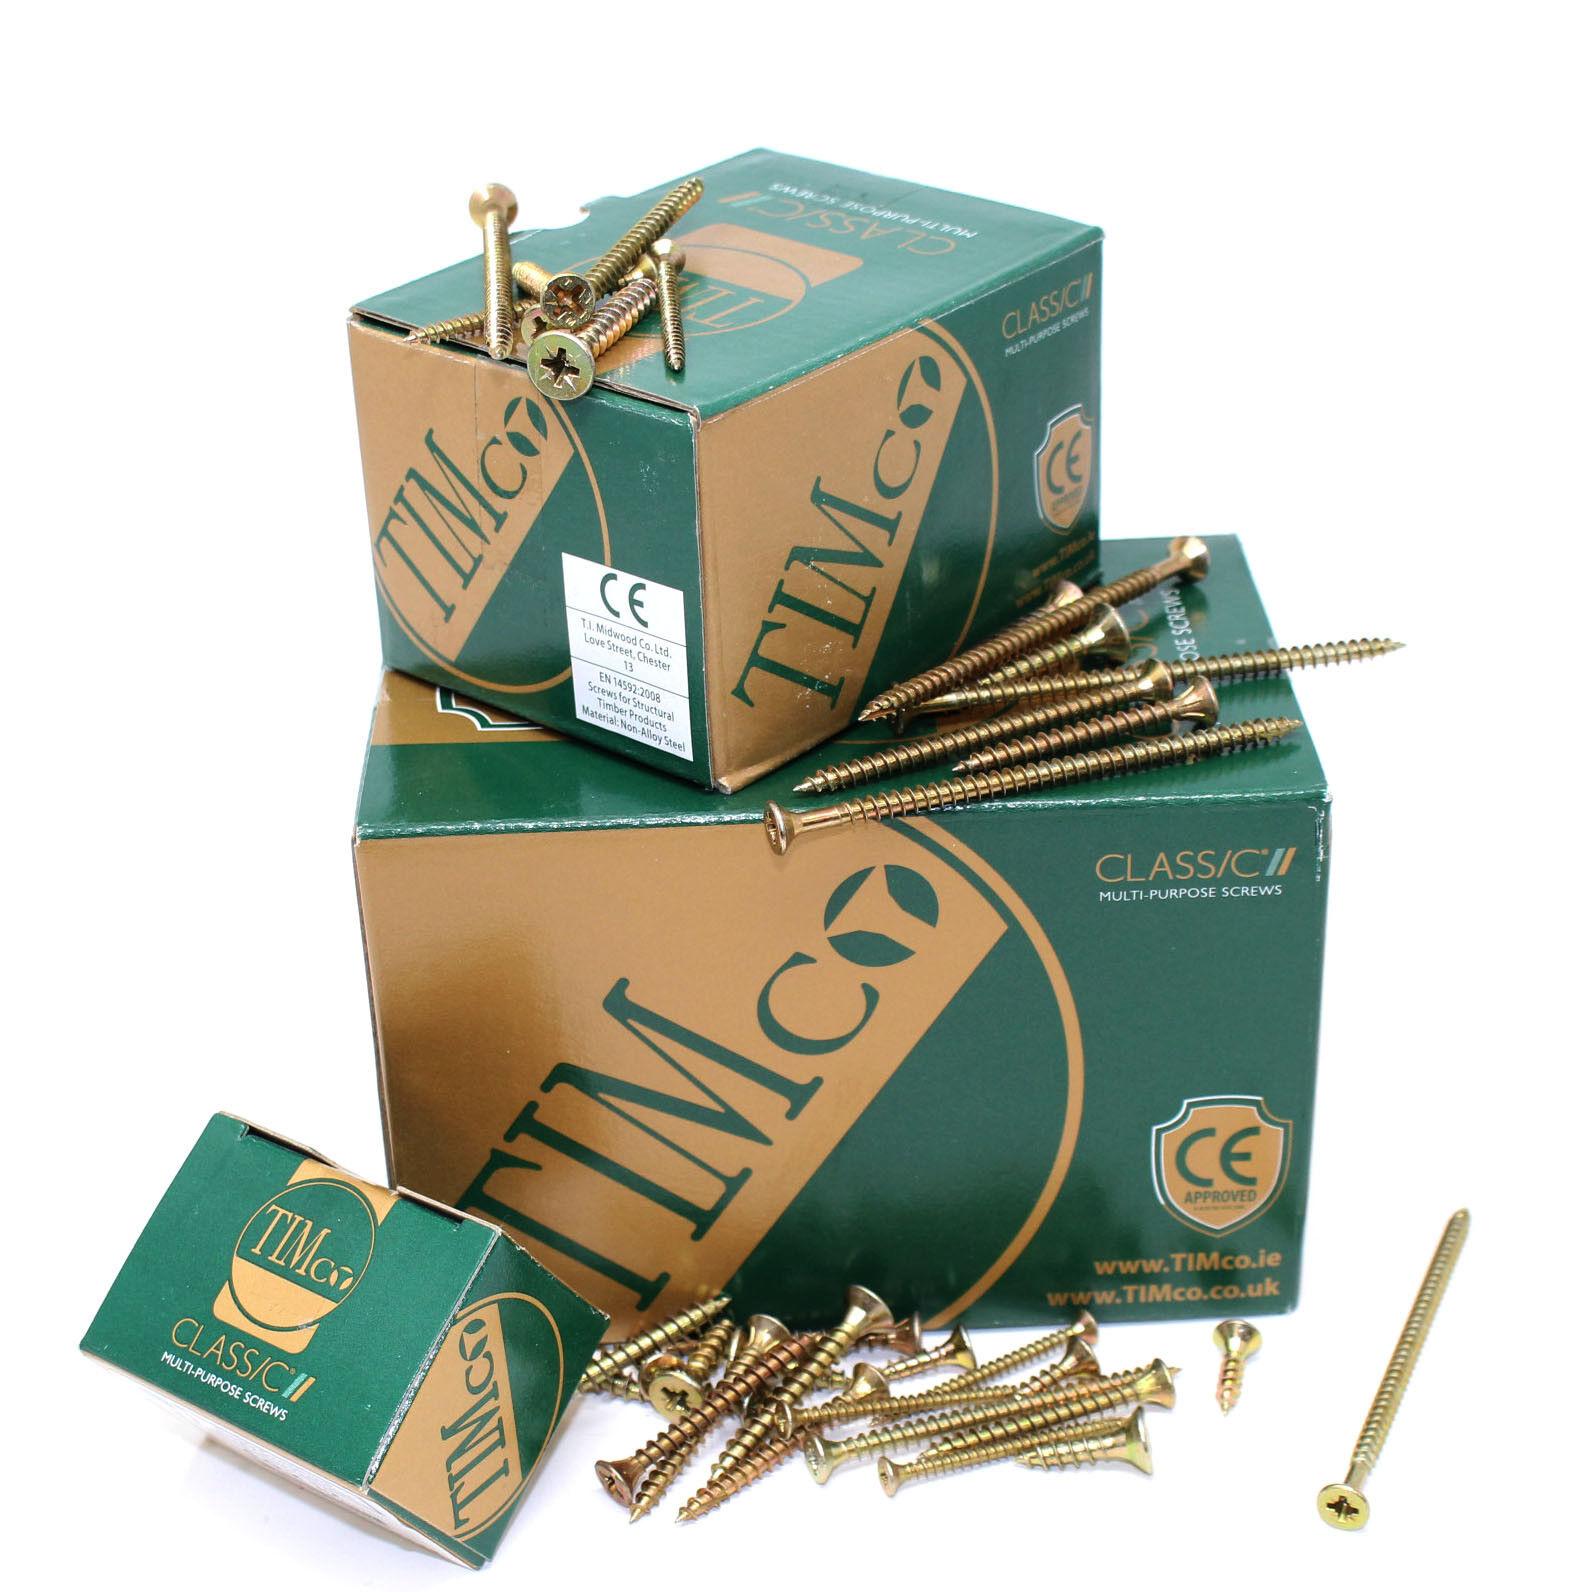 "WOOD MDF /& PLASTIC MULTI PURPOSE CSK SCREW 4g x 1//2/"" TIMCO 3.0 x 12 1000"